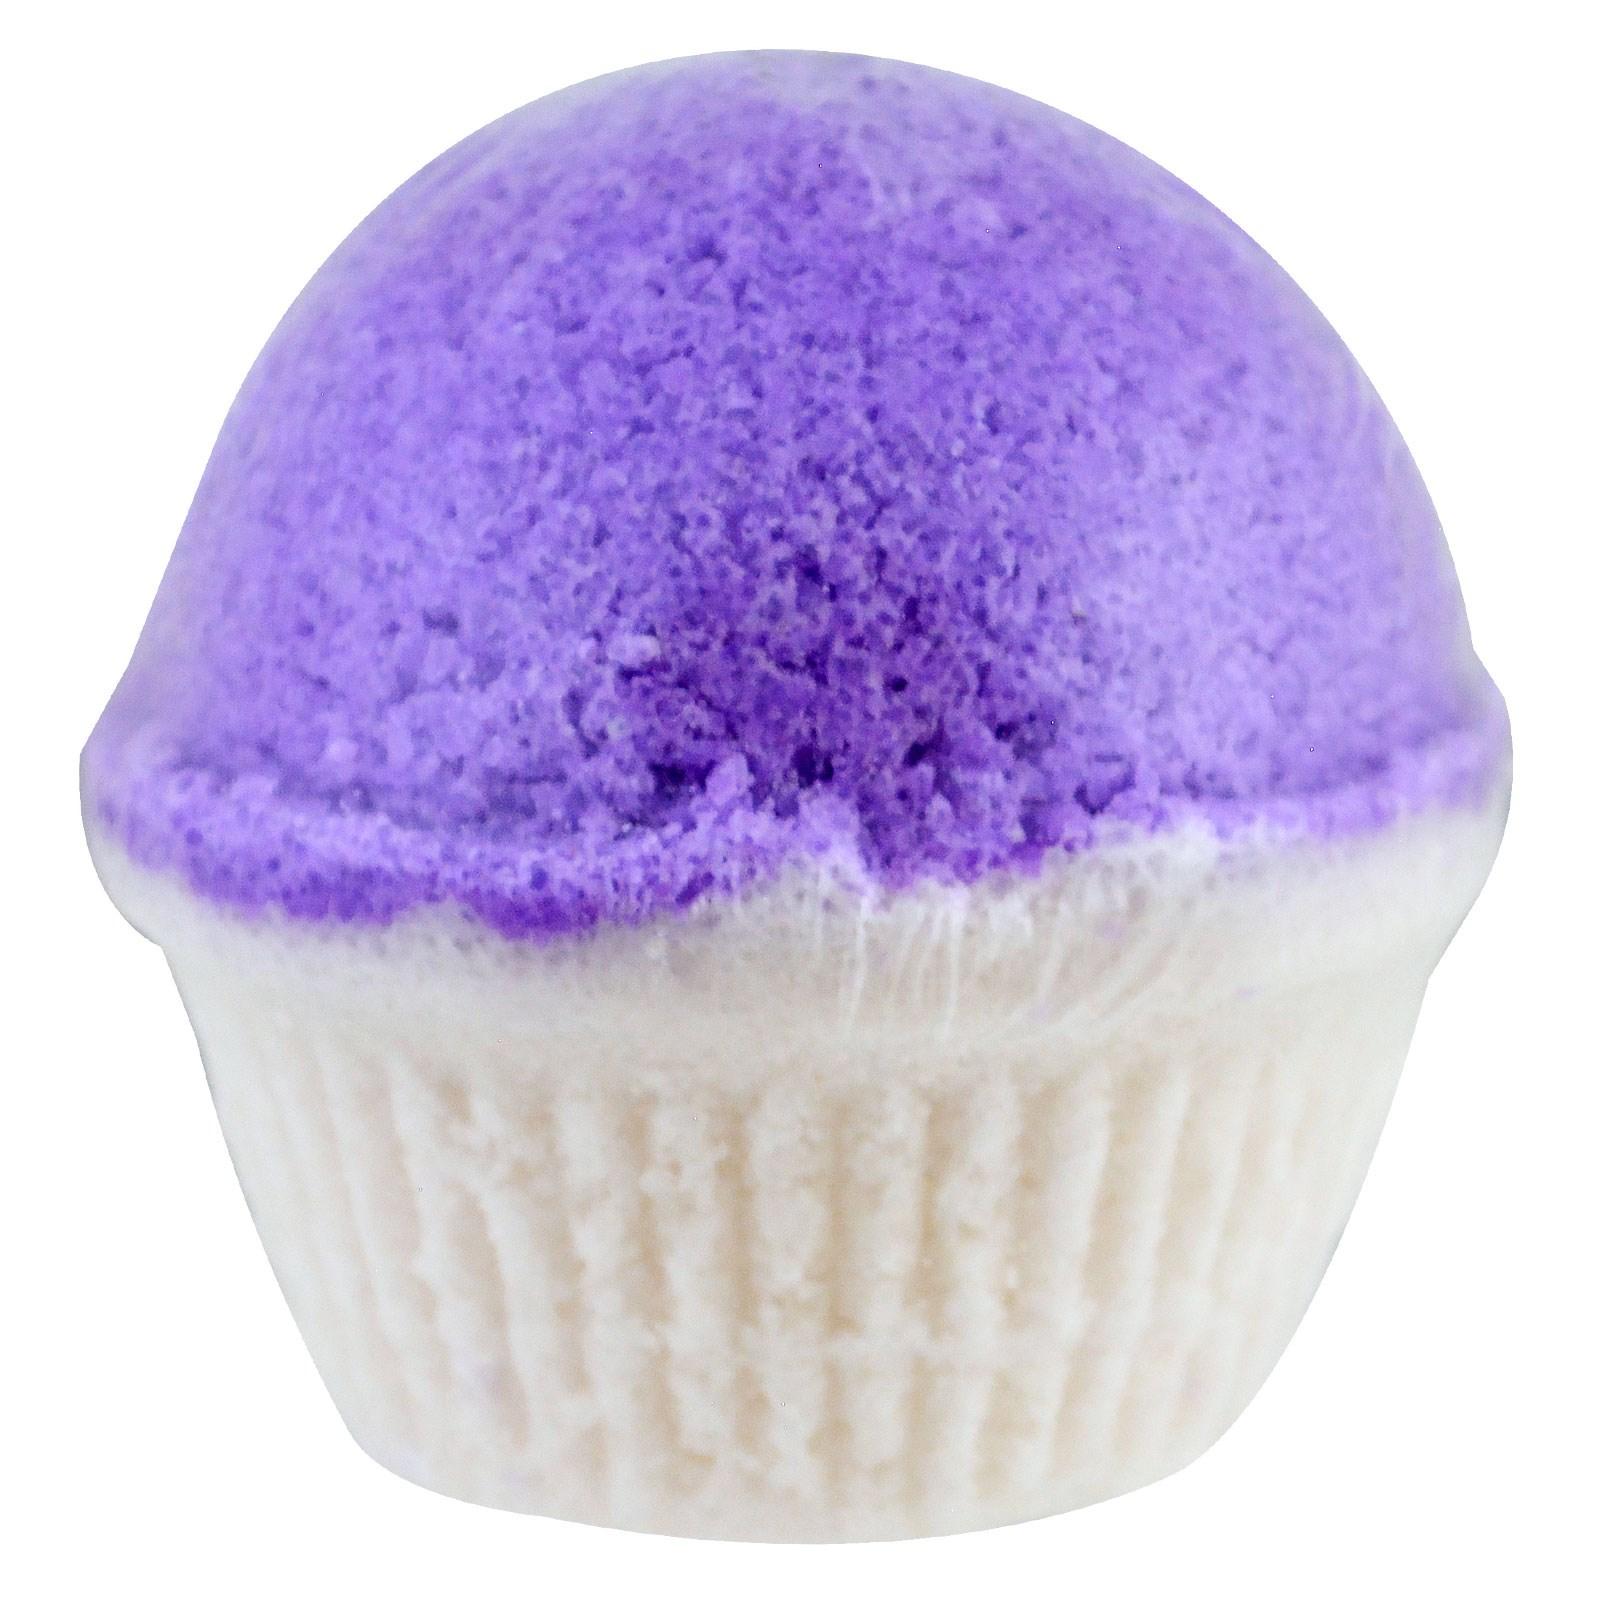 Eclair Naturals Fizzy Bath Cupcake Lavender Vanilla 6 Oz 170 G Aromatherapy Sugar Scrub Click To Zoom